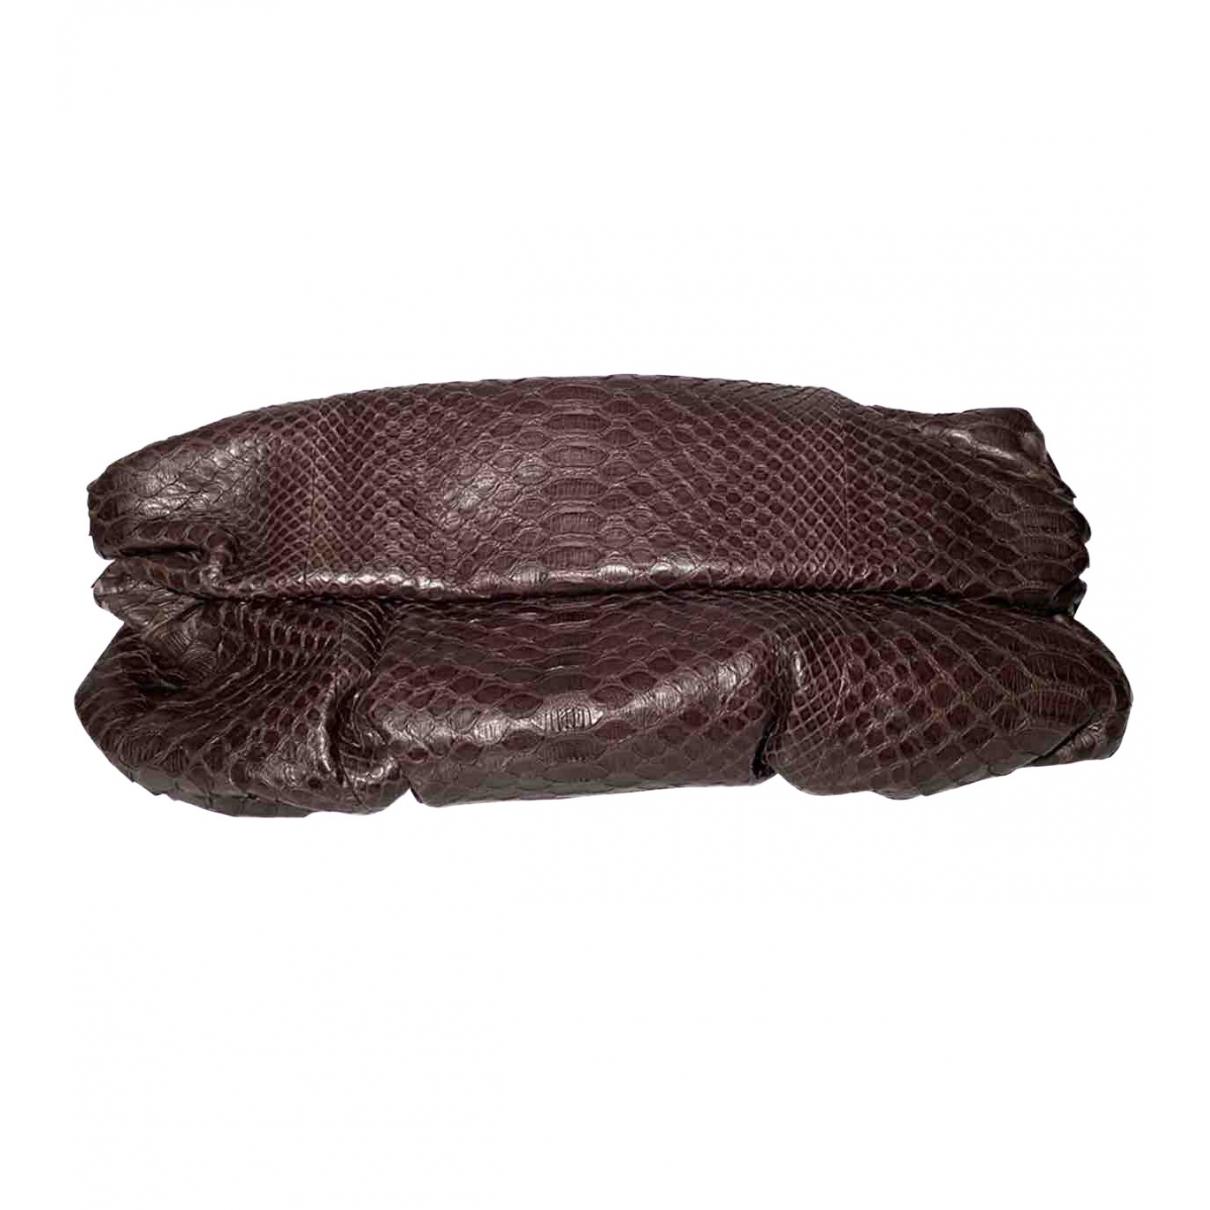 Gina \N Brown Leather Clutch bag for Women \N